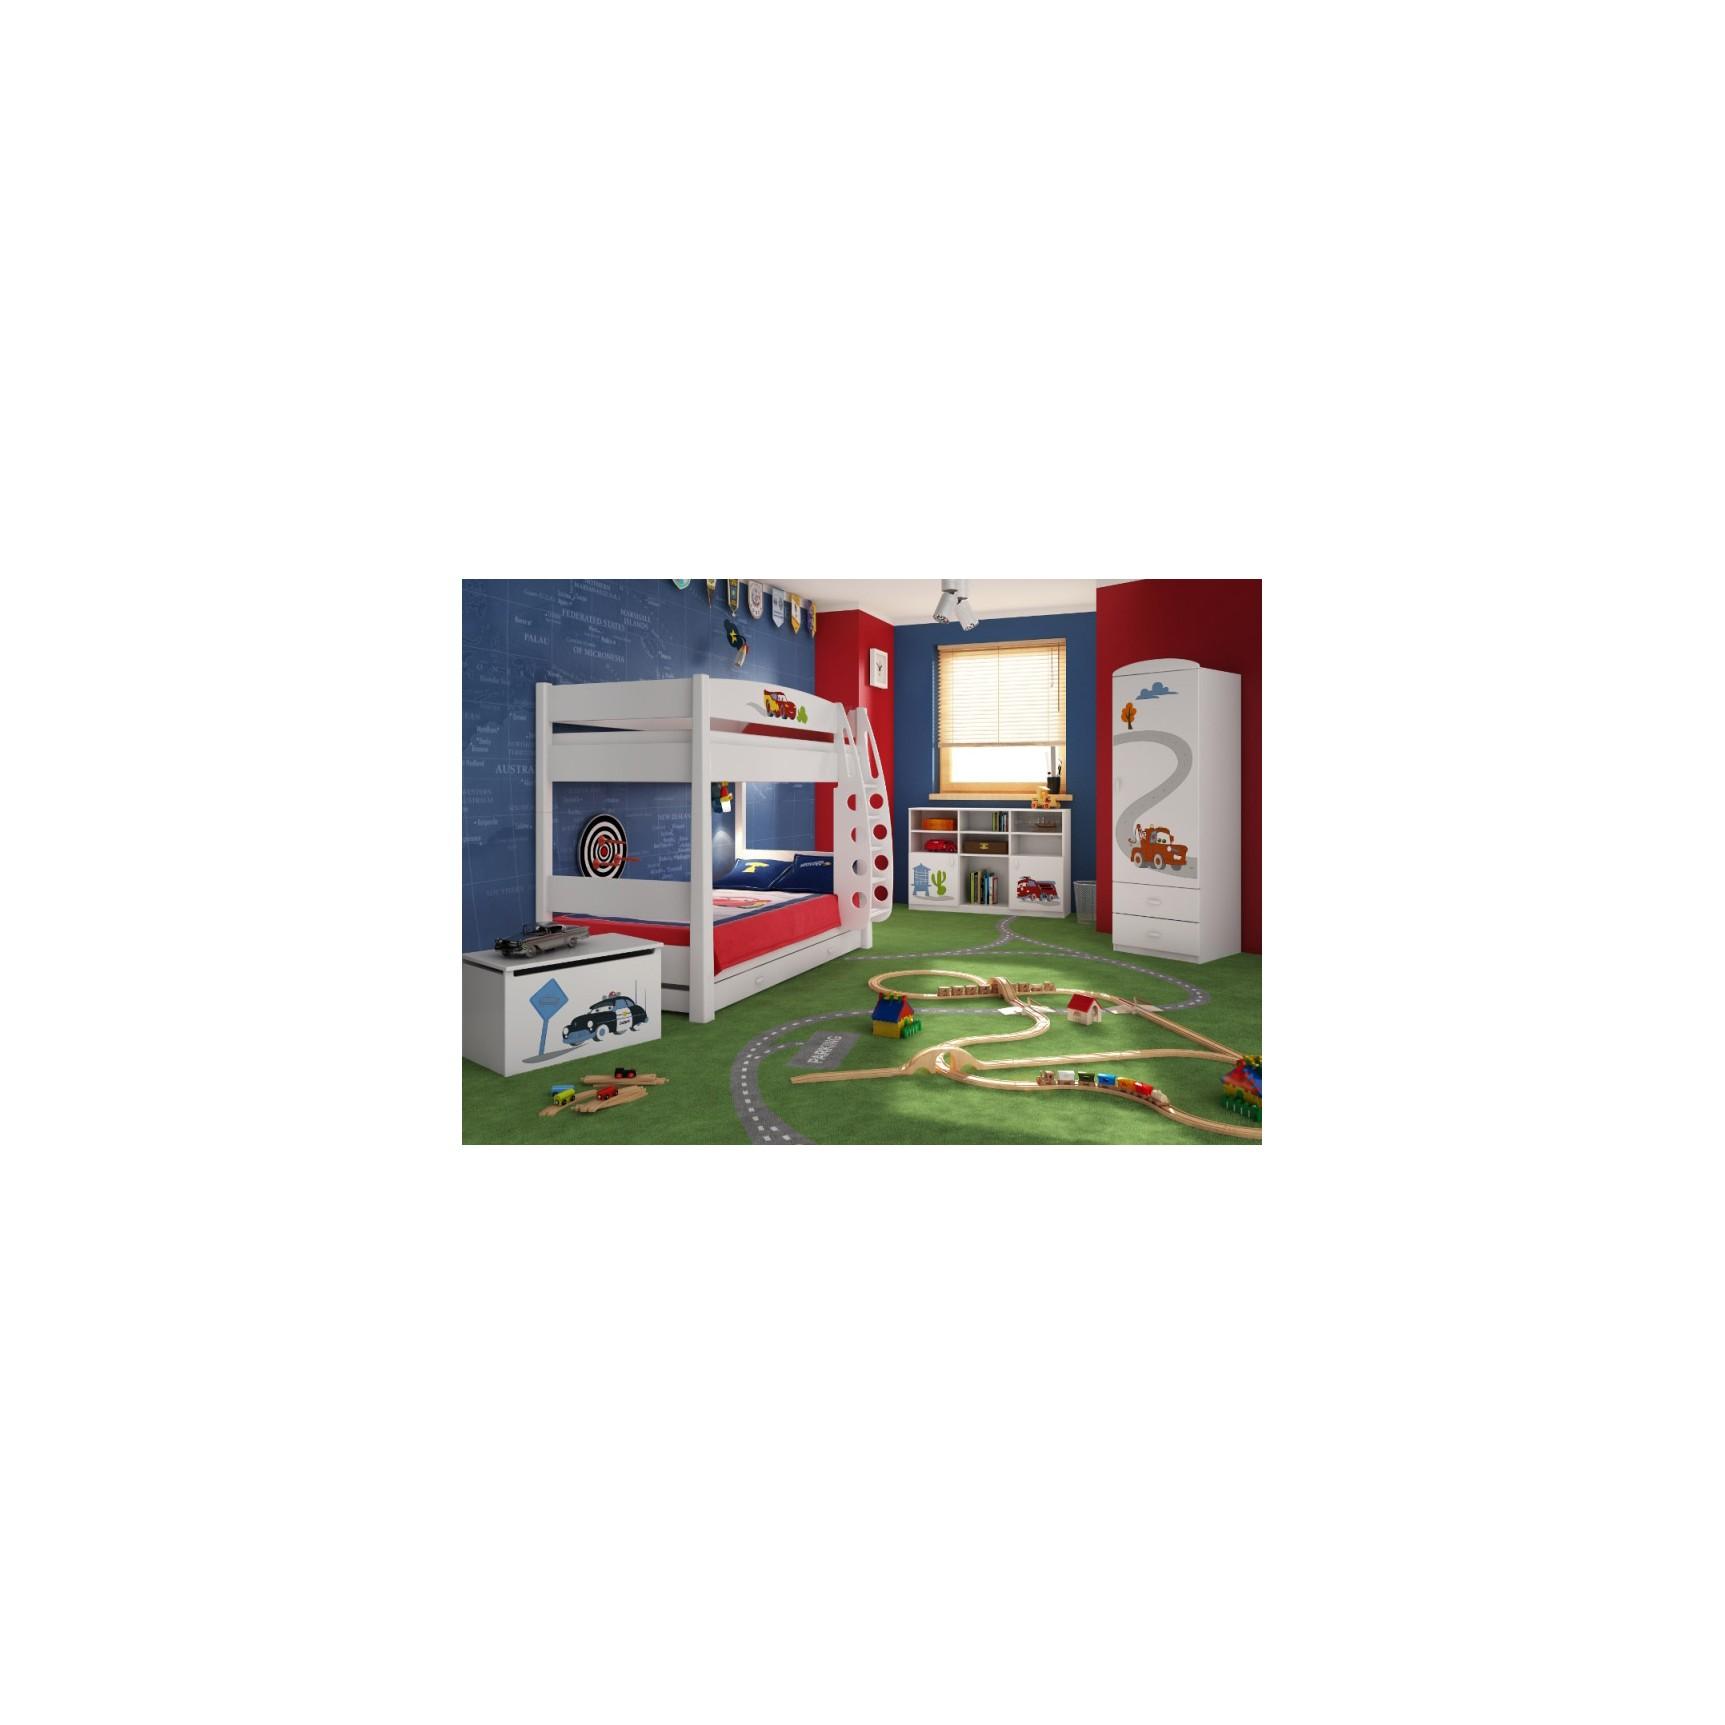 meuble tv zeos 190 cm ch ne miel meuble tv design boutique de meuble desing. Black Bedroom Furniture Sets. Home Design Ideas